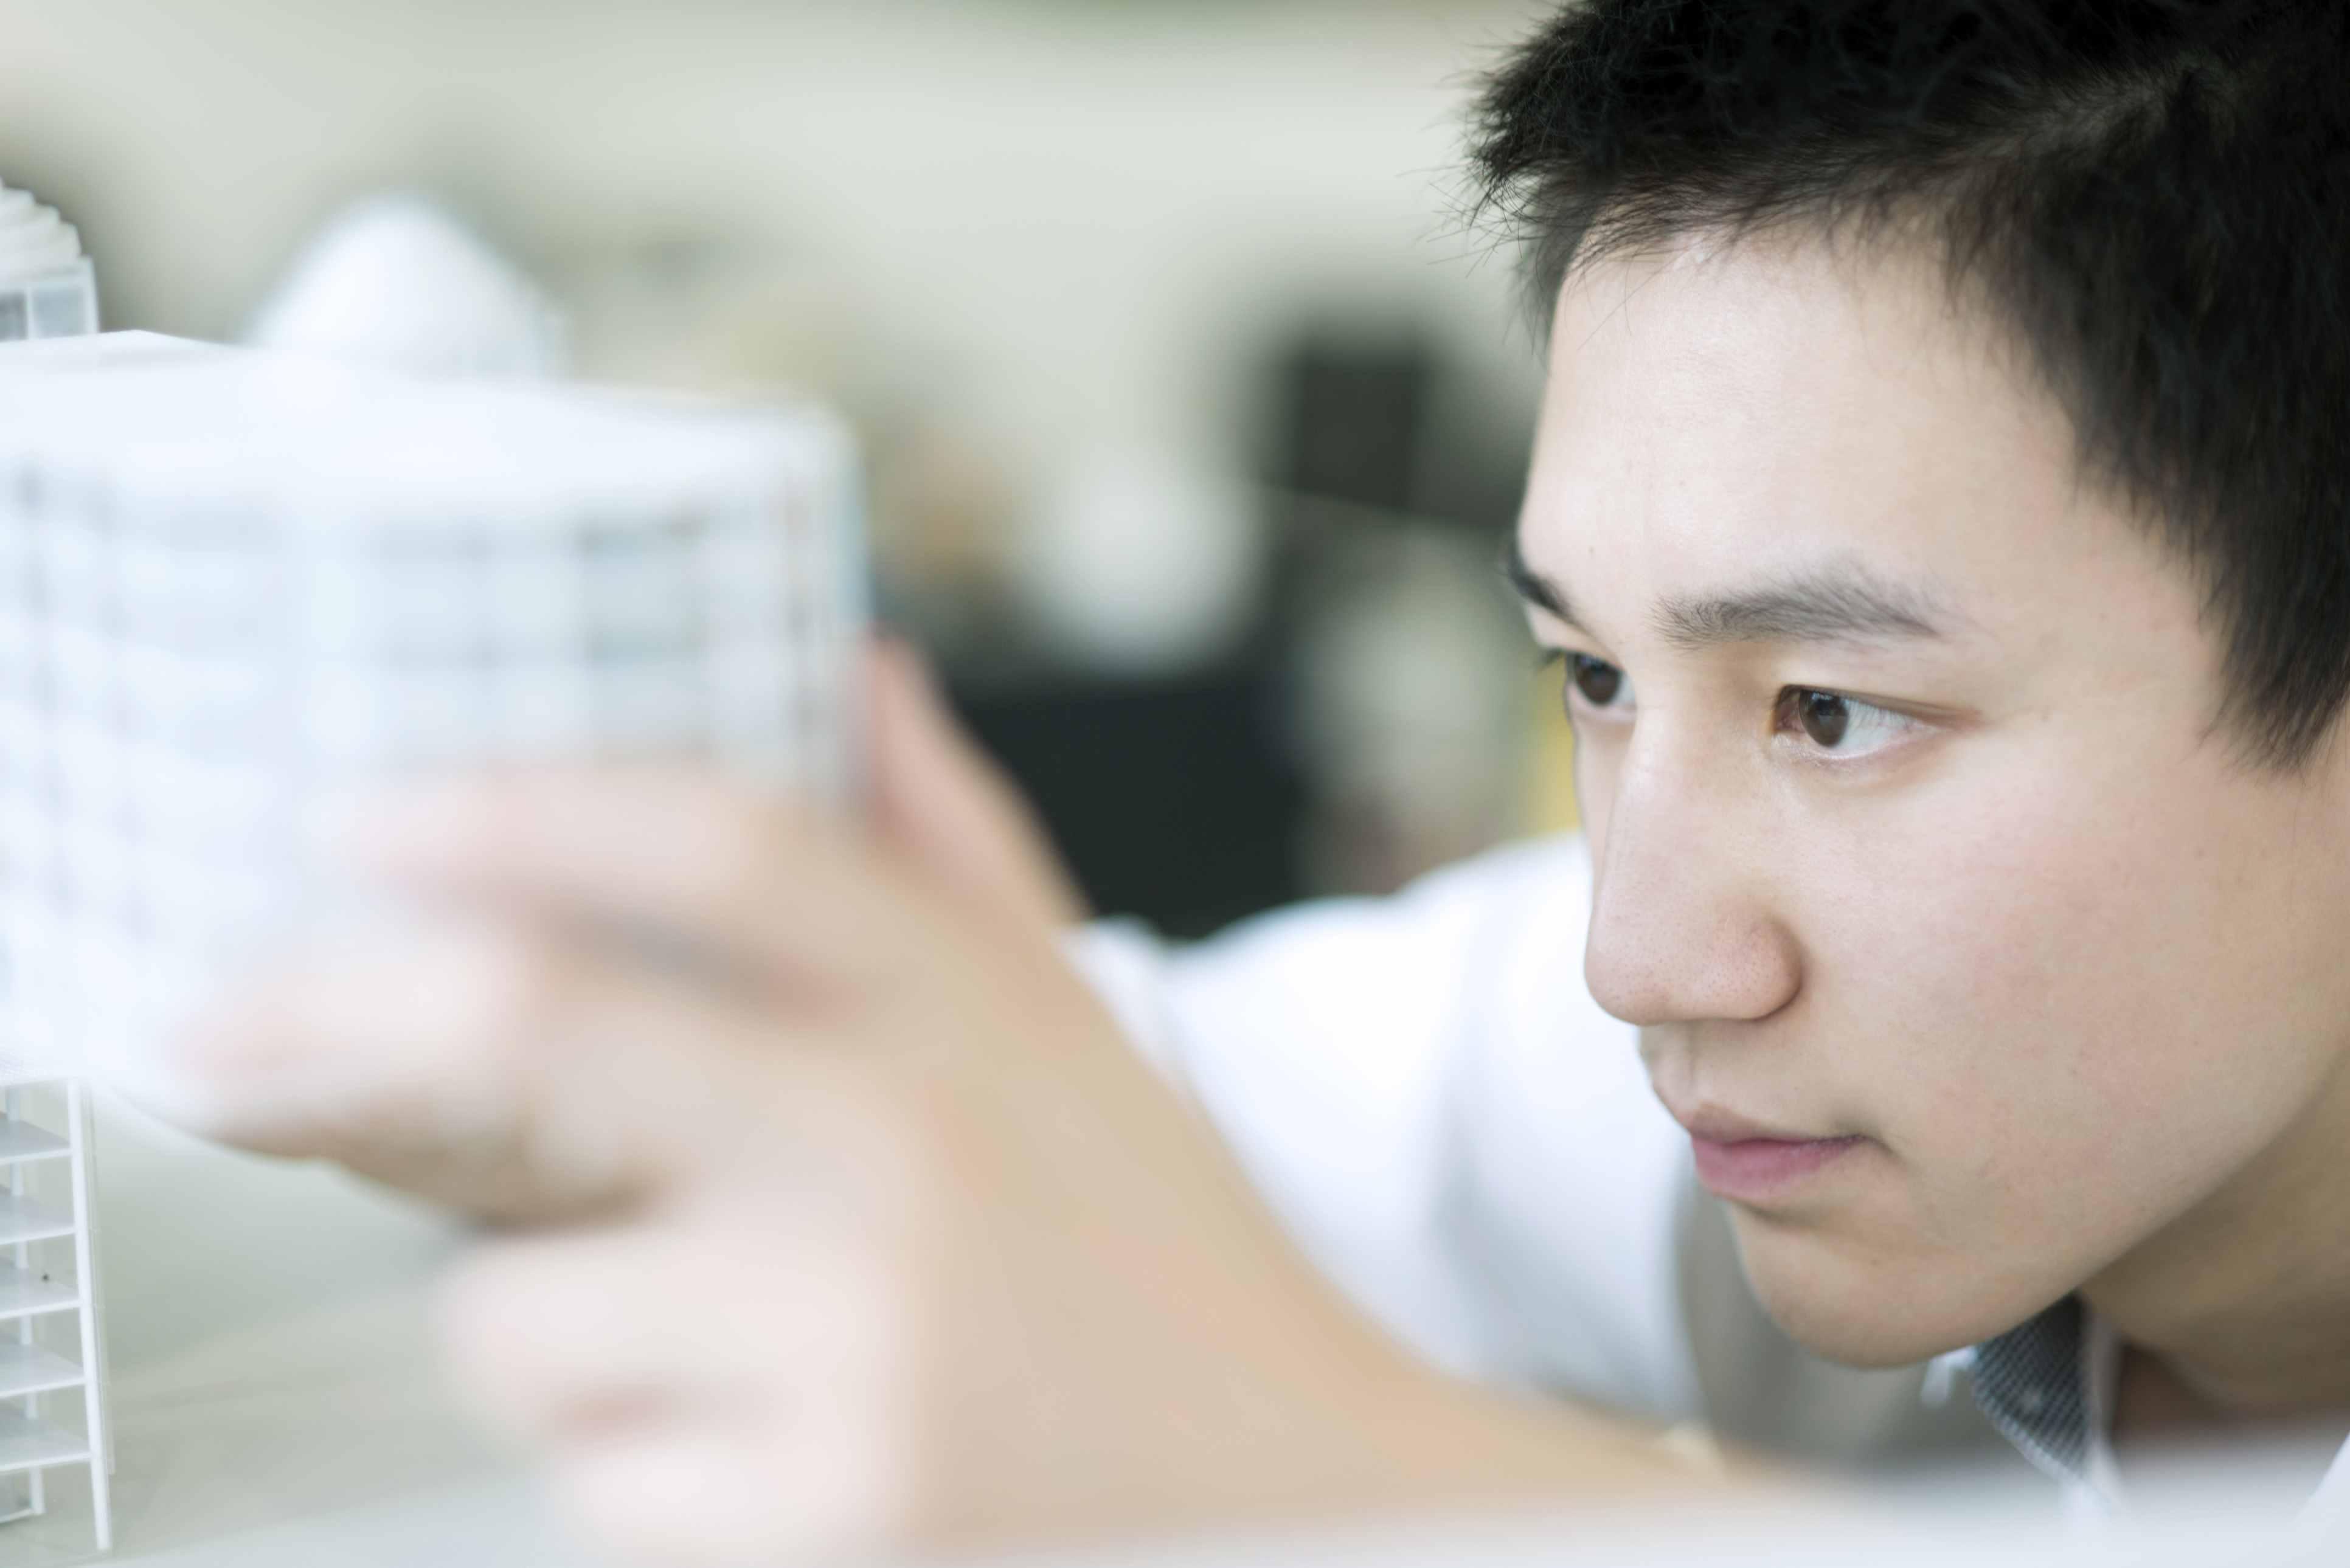 Asian student examining model